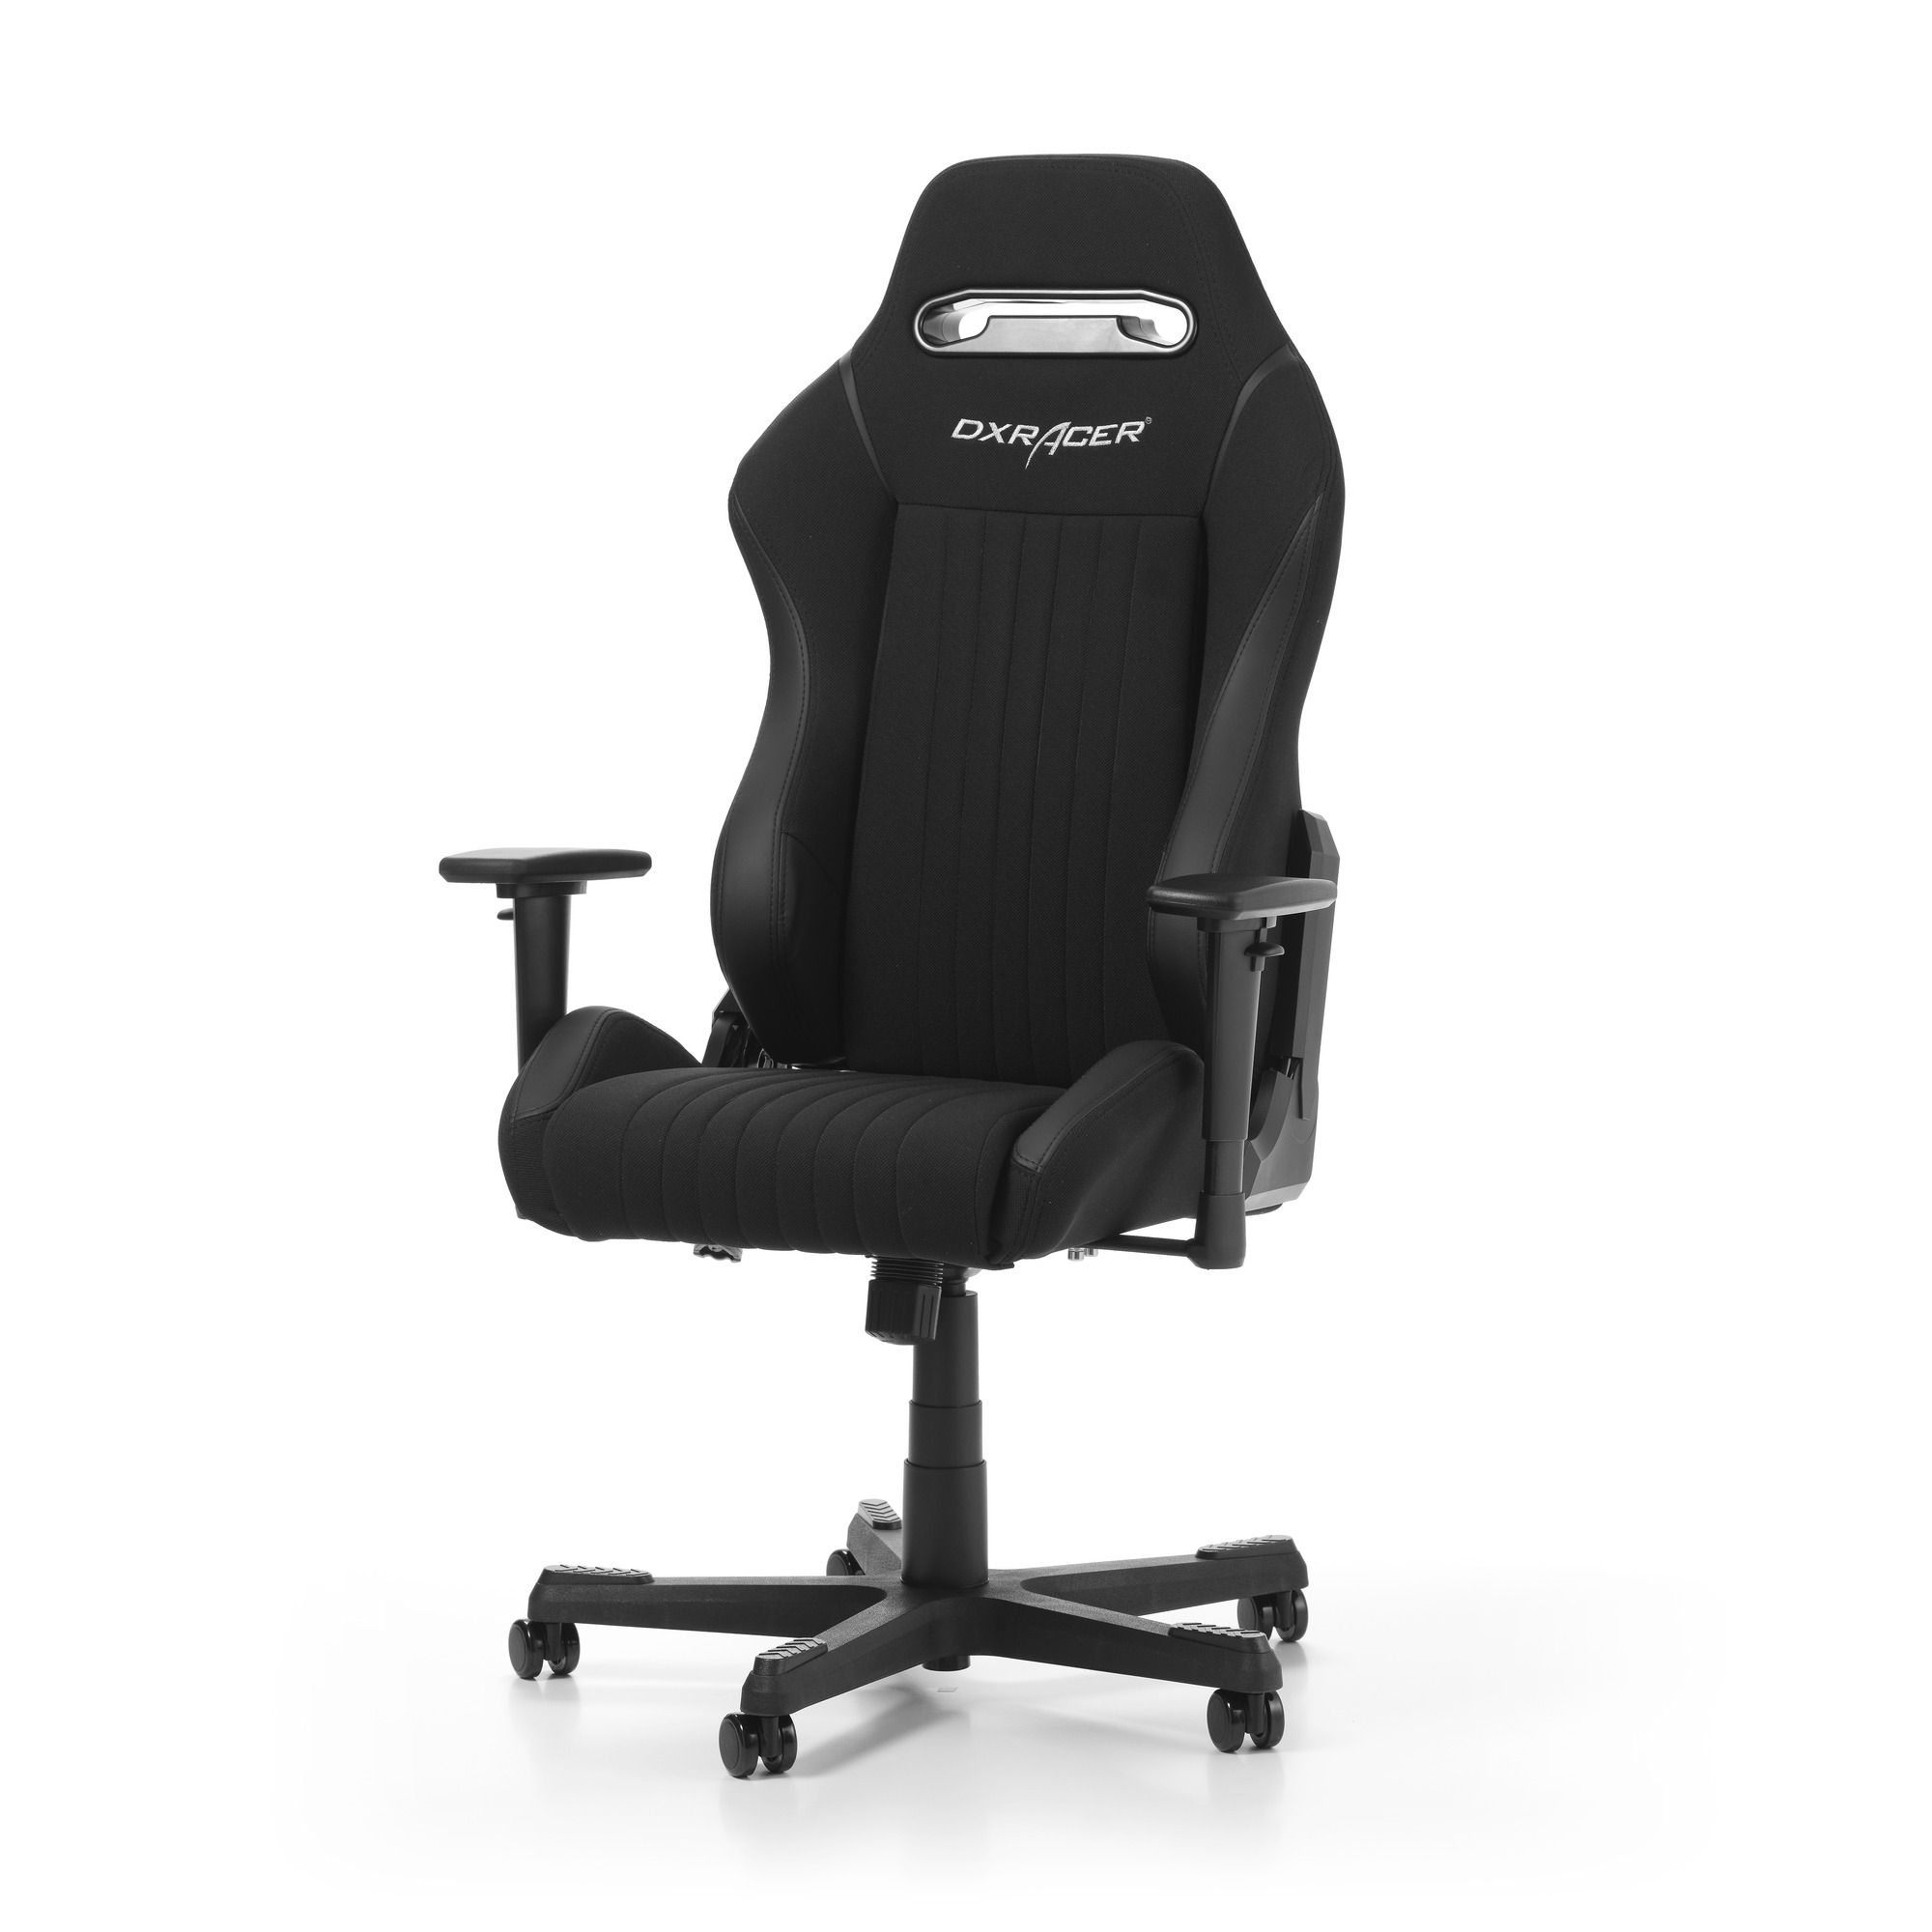 Геймърски стол DXRacer - серия DRIFTING, черен - OH/DS02/N - 10